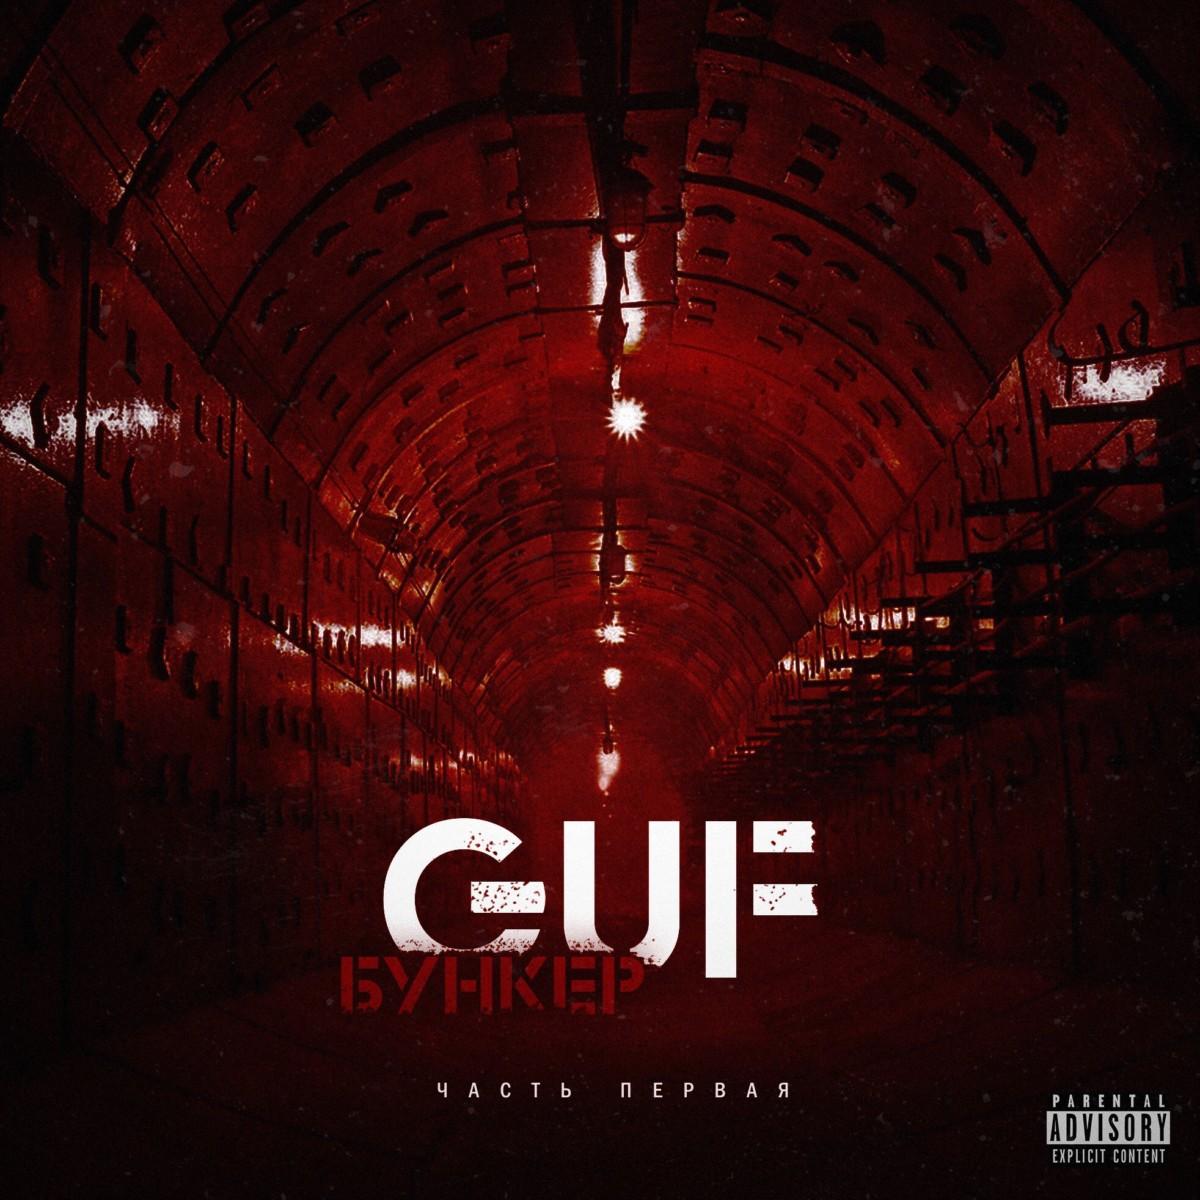 Guf — «Бункер ч. 1»